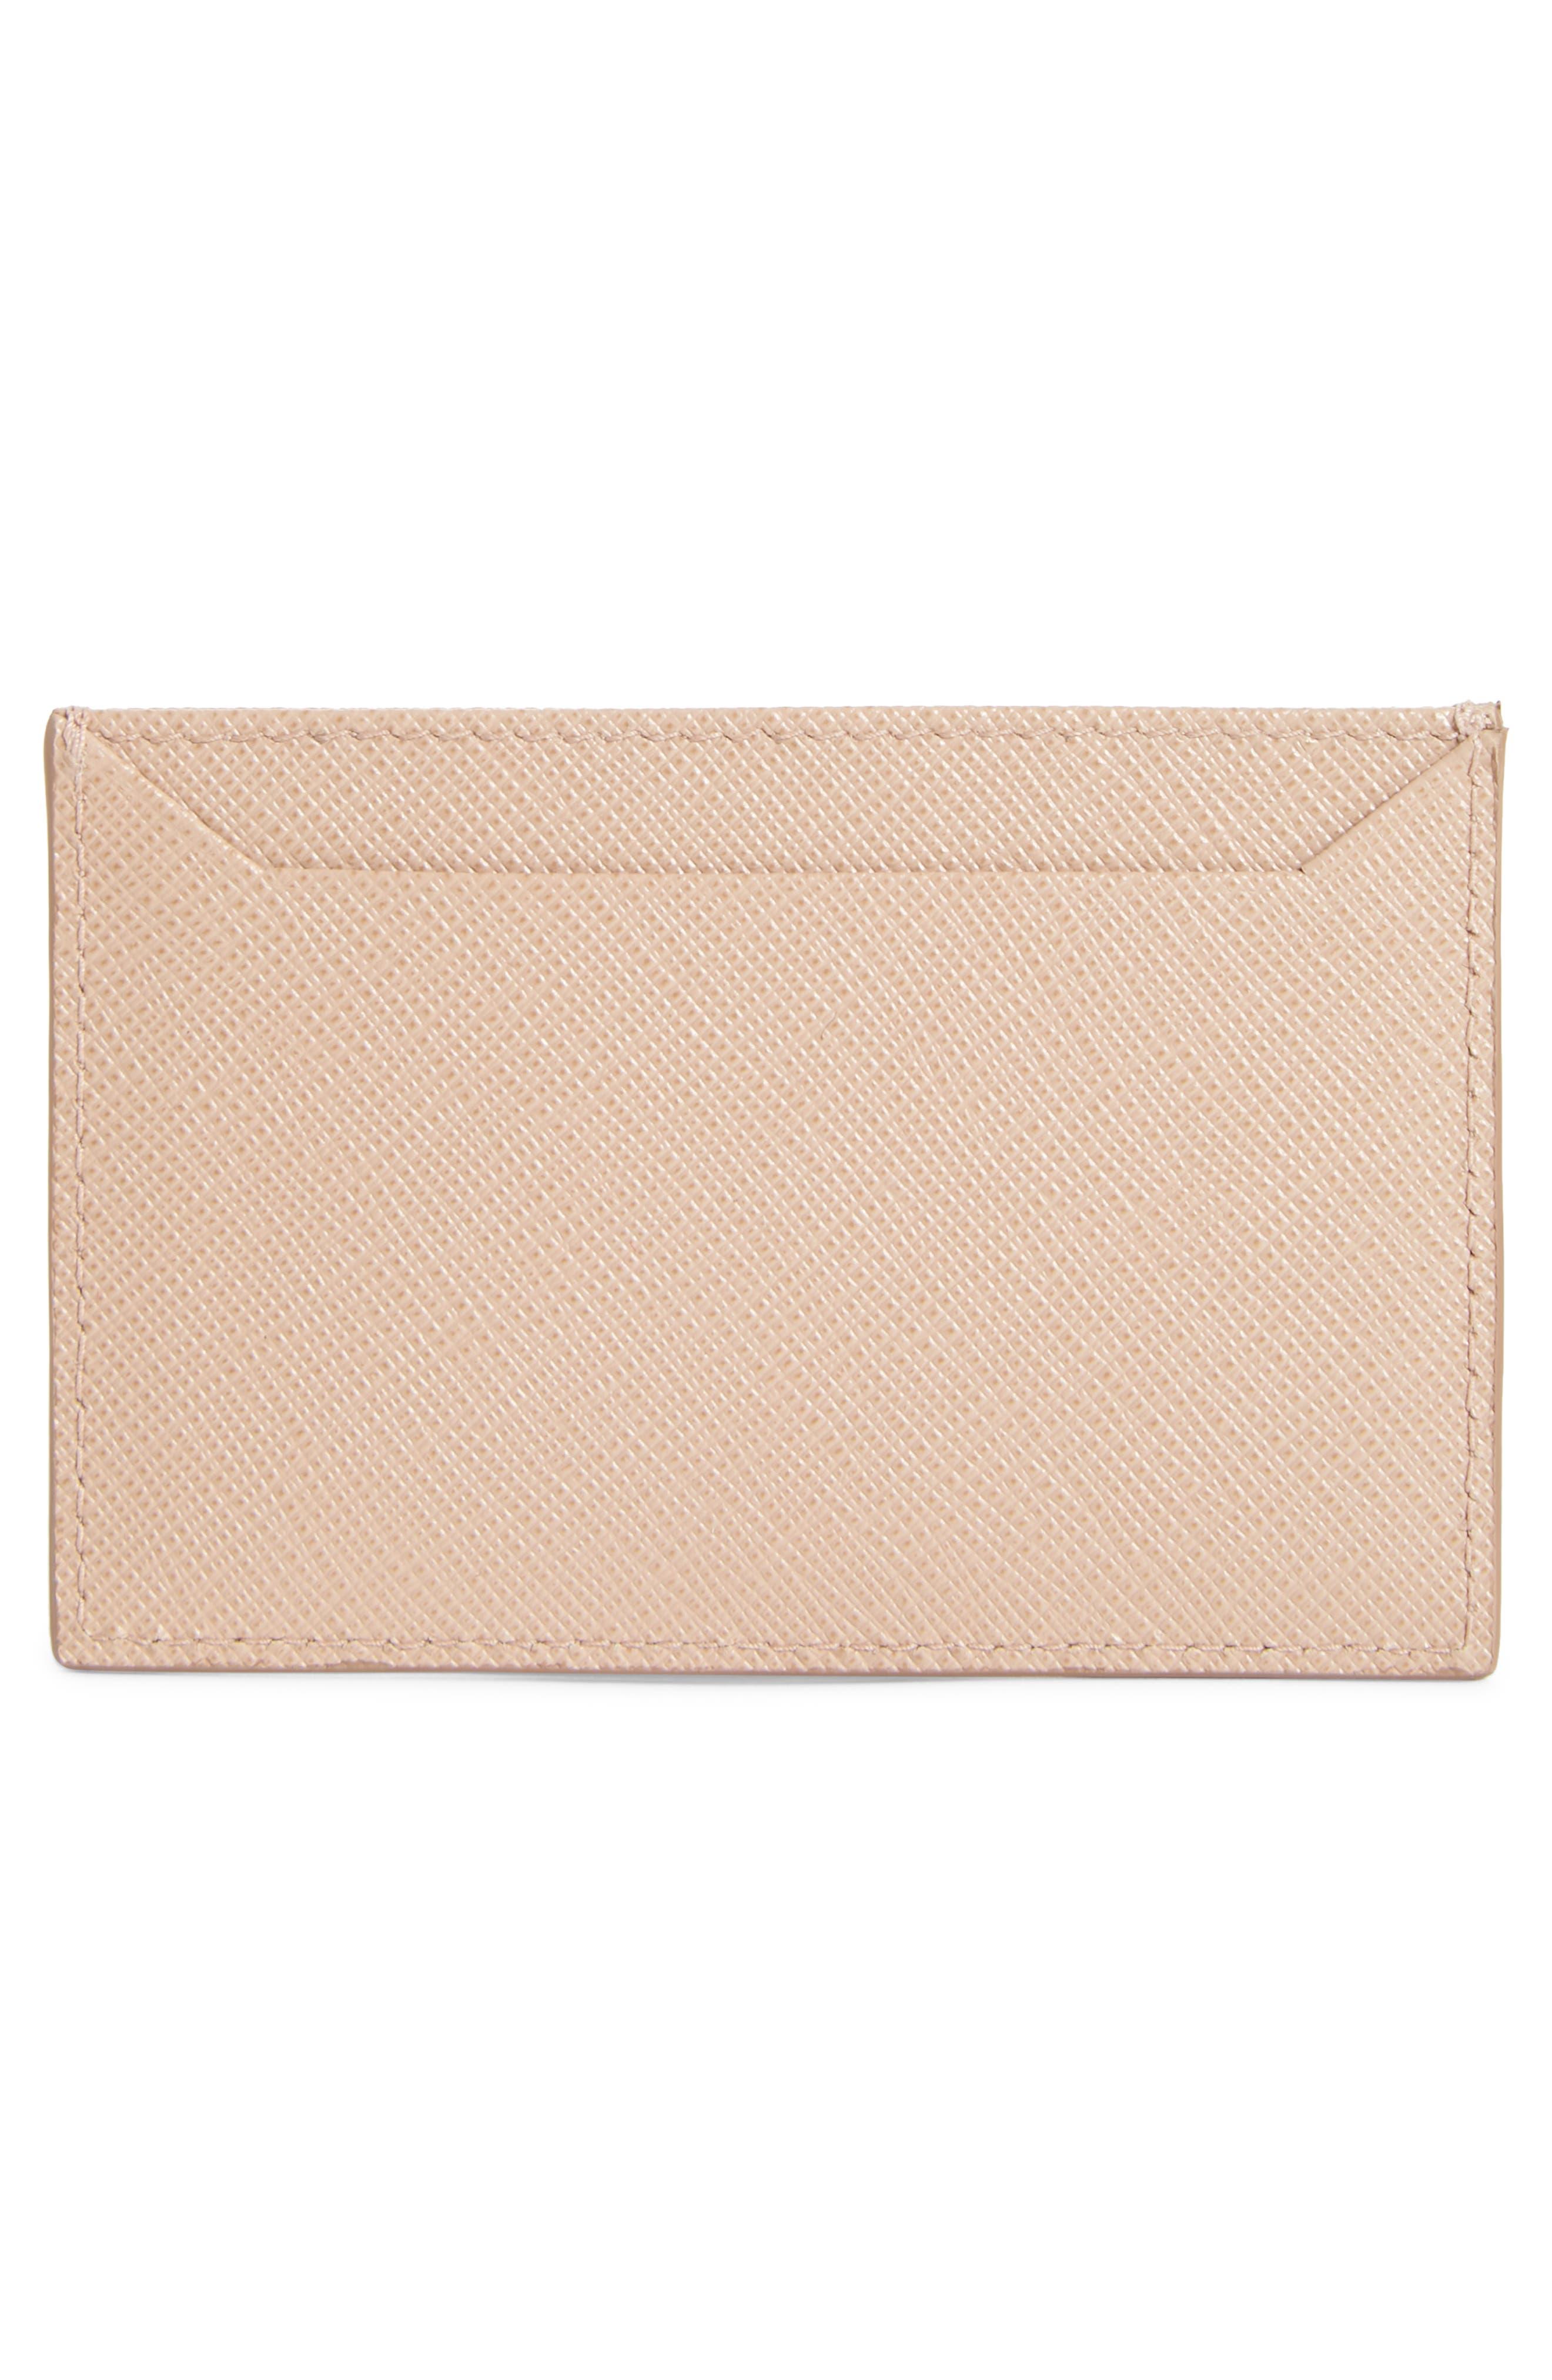 Saffiano Metal Oro Calfskin Leather Card Case,                             Alternate thumbnail 2, color,                             Cipria